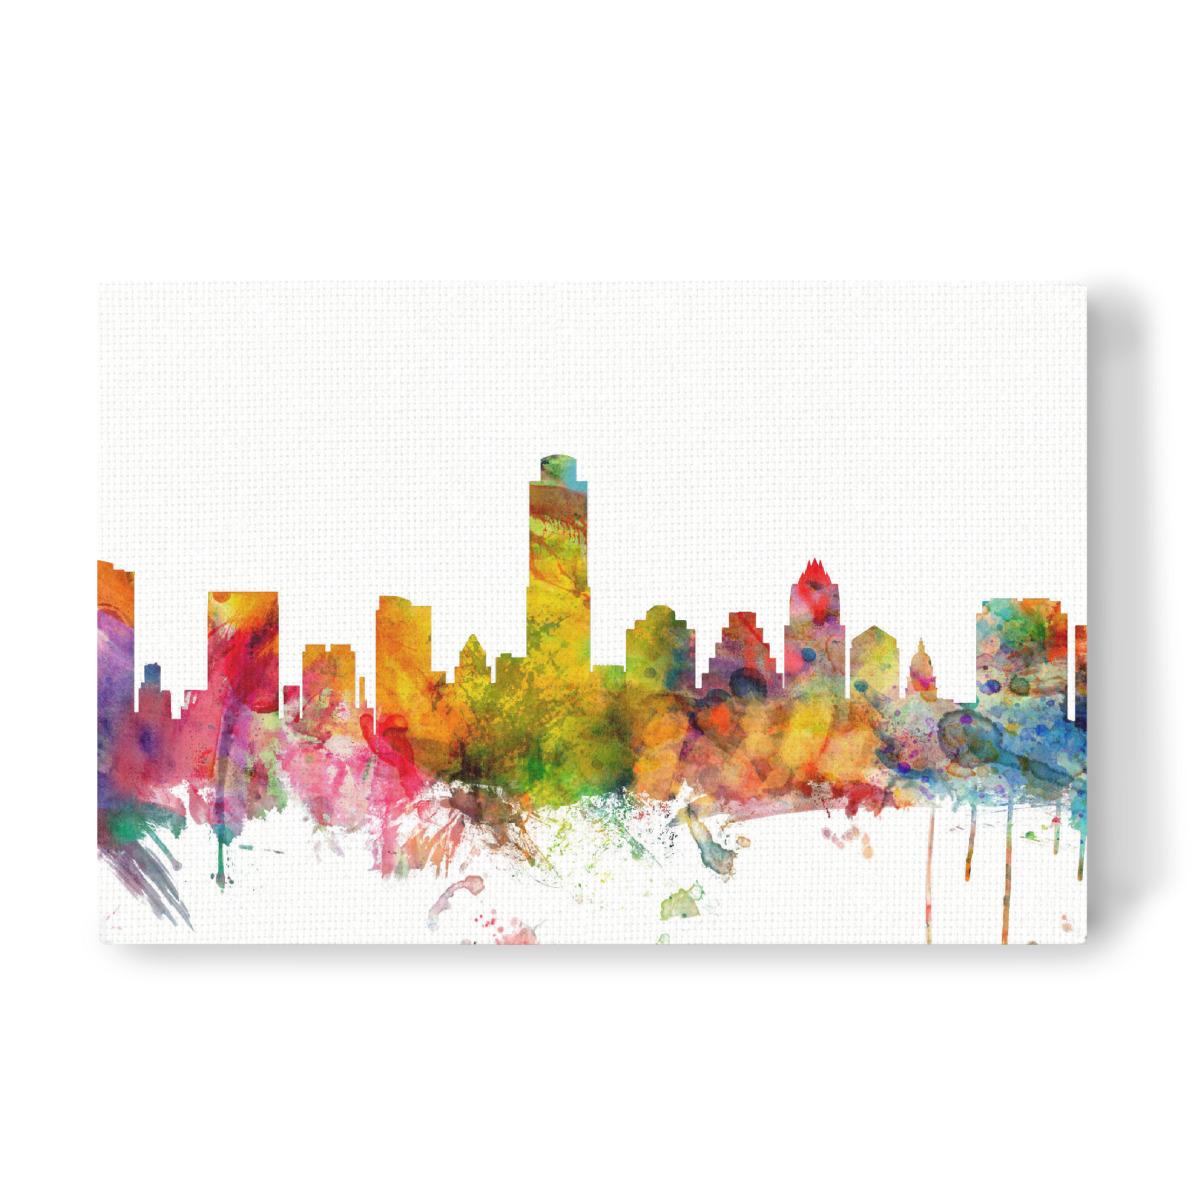 Austin Texas Watercolor als Leinwand bei artboxONE kaufen